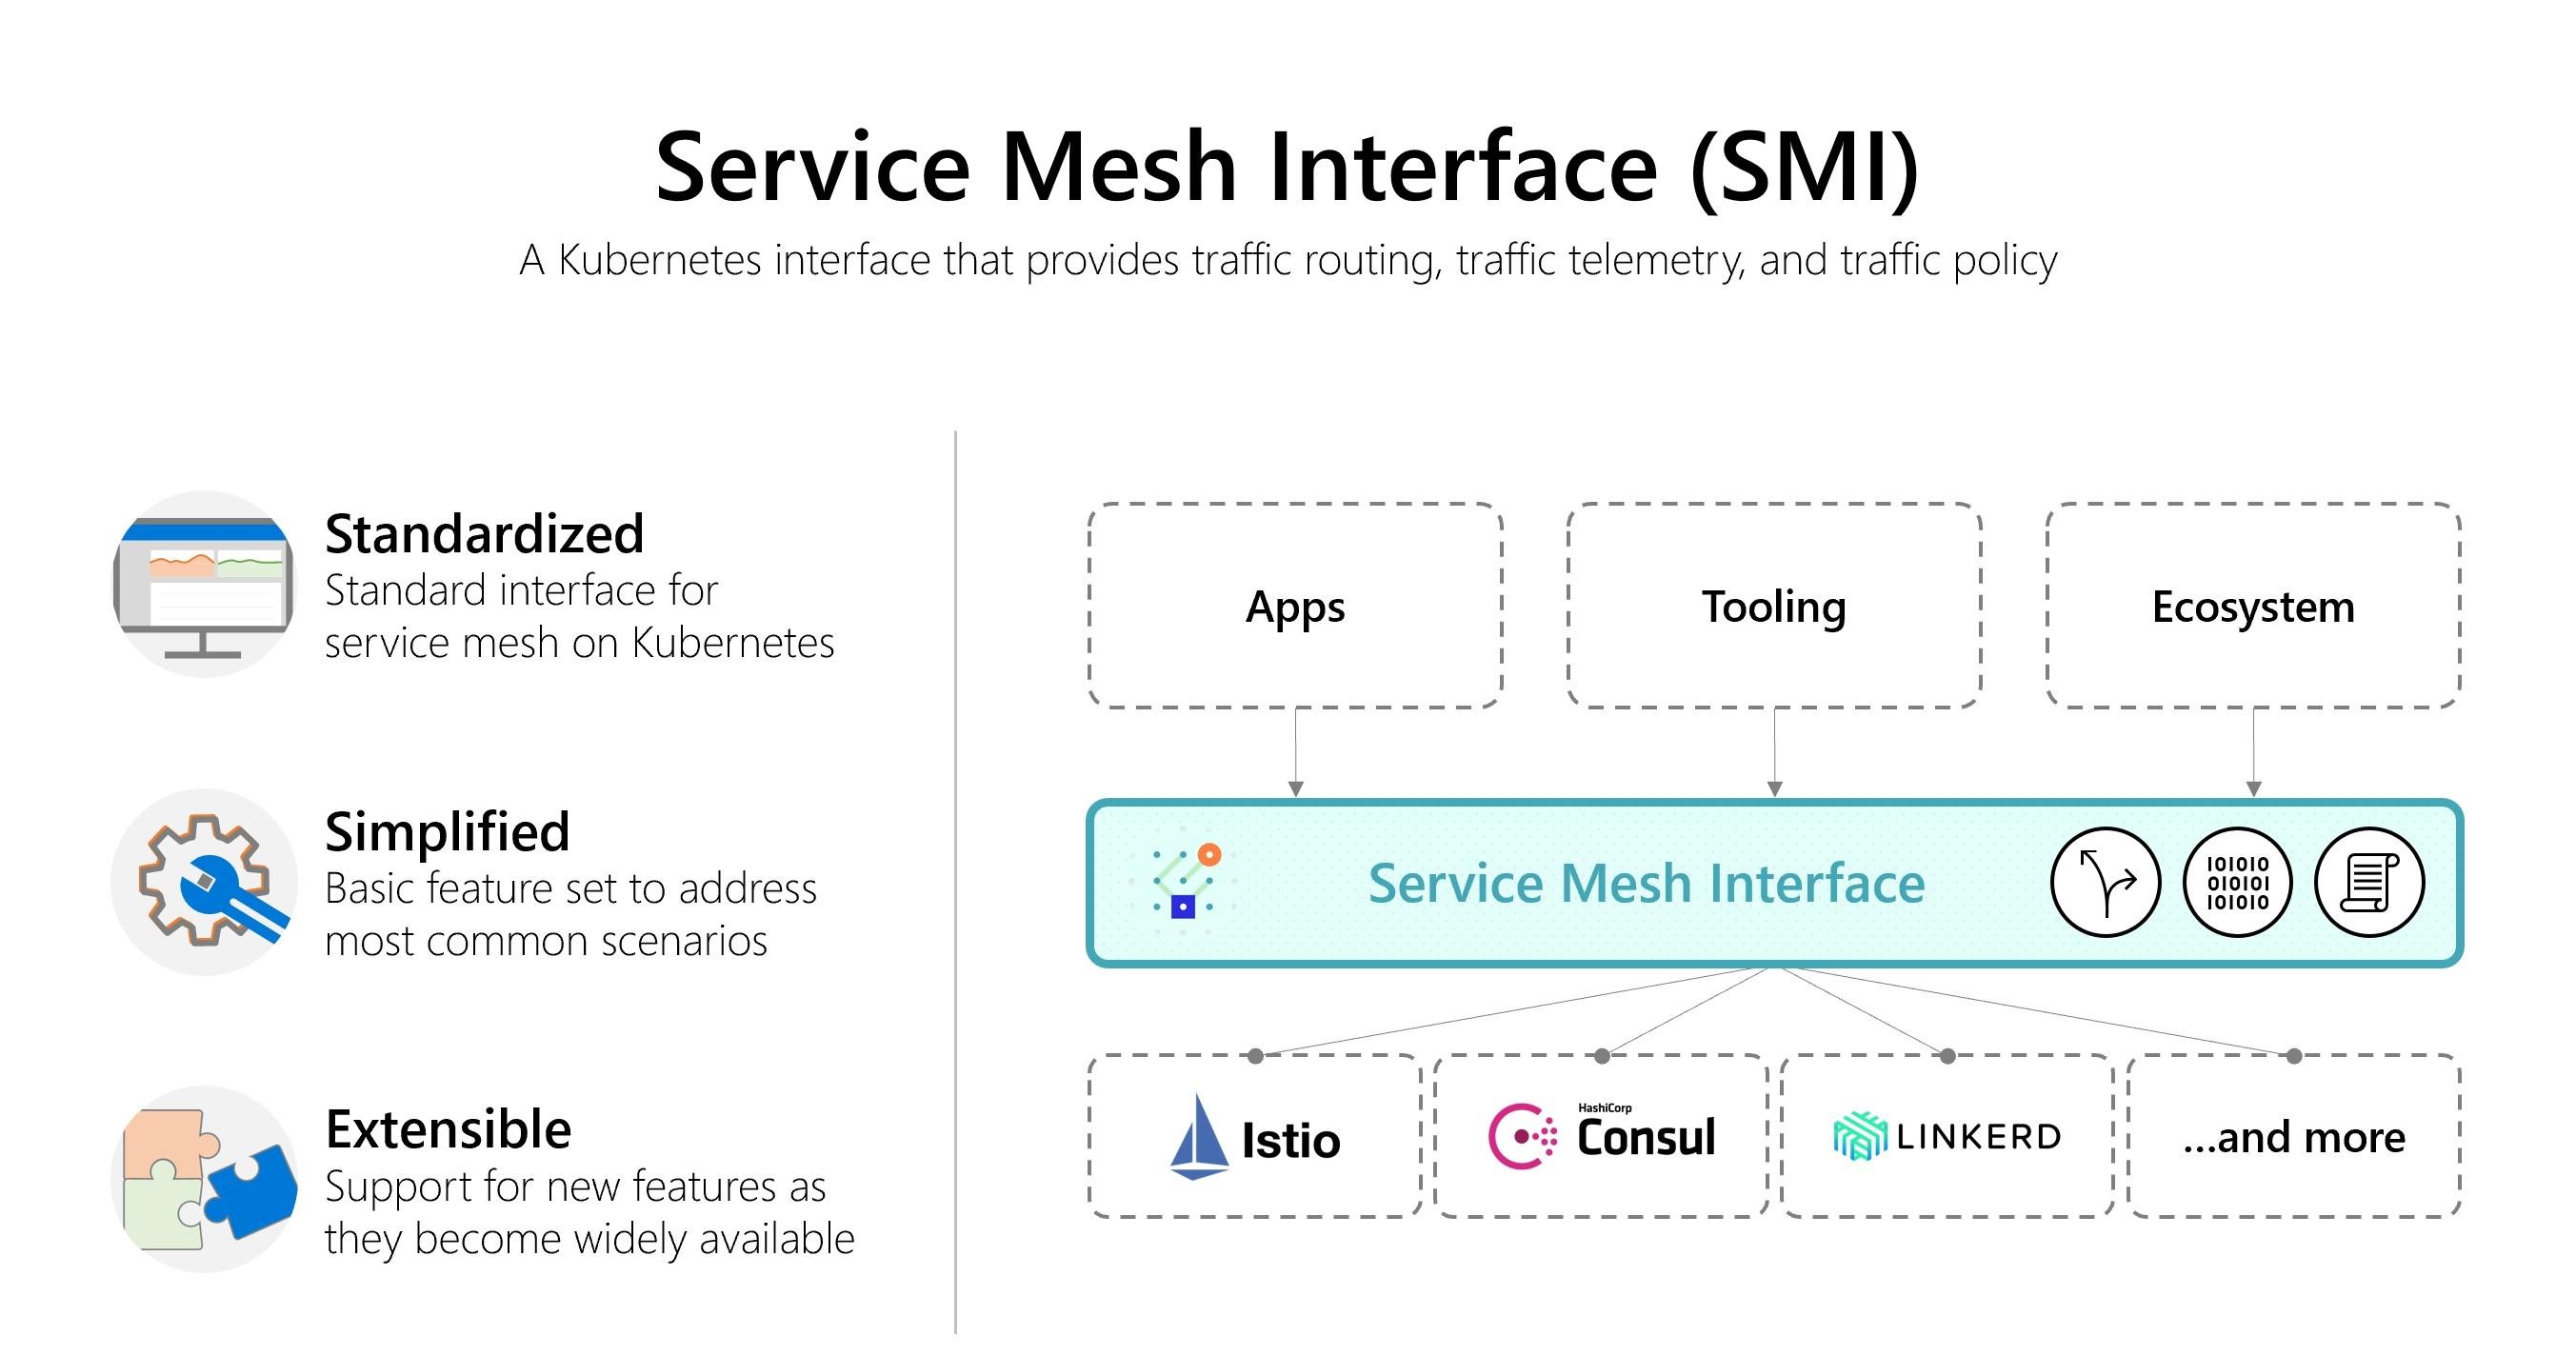 Microsoft makes a push for service mesh interoperability Microsoft makes a push for service mesh interoperability SMI Graphic